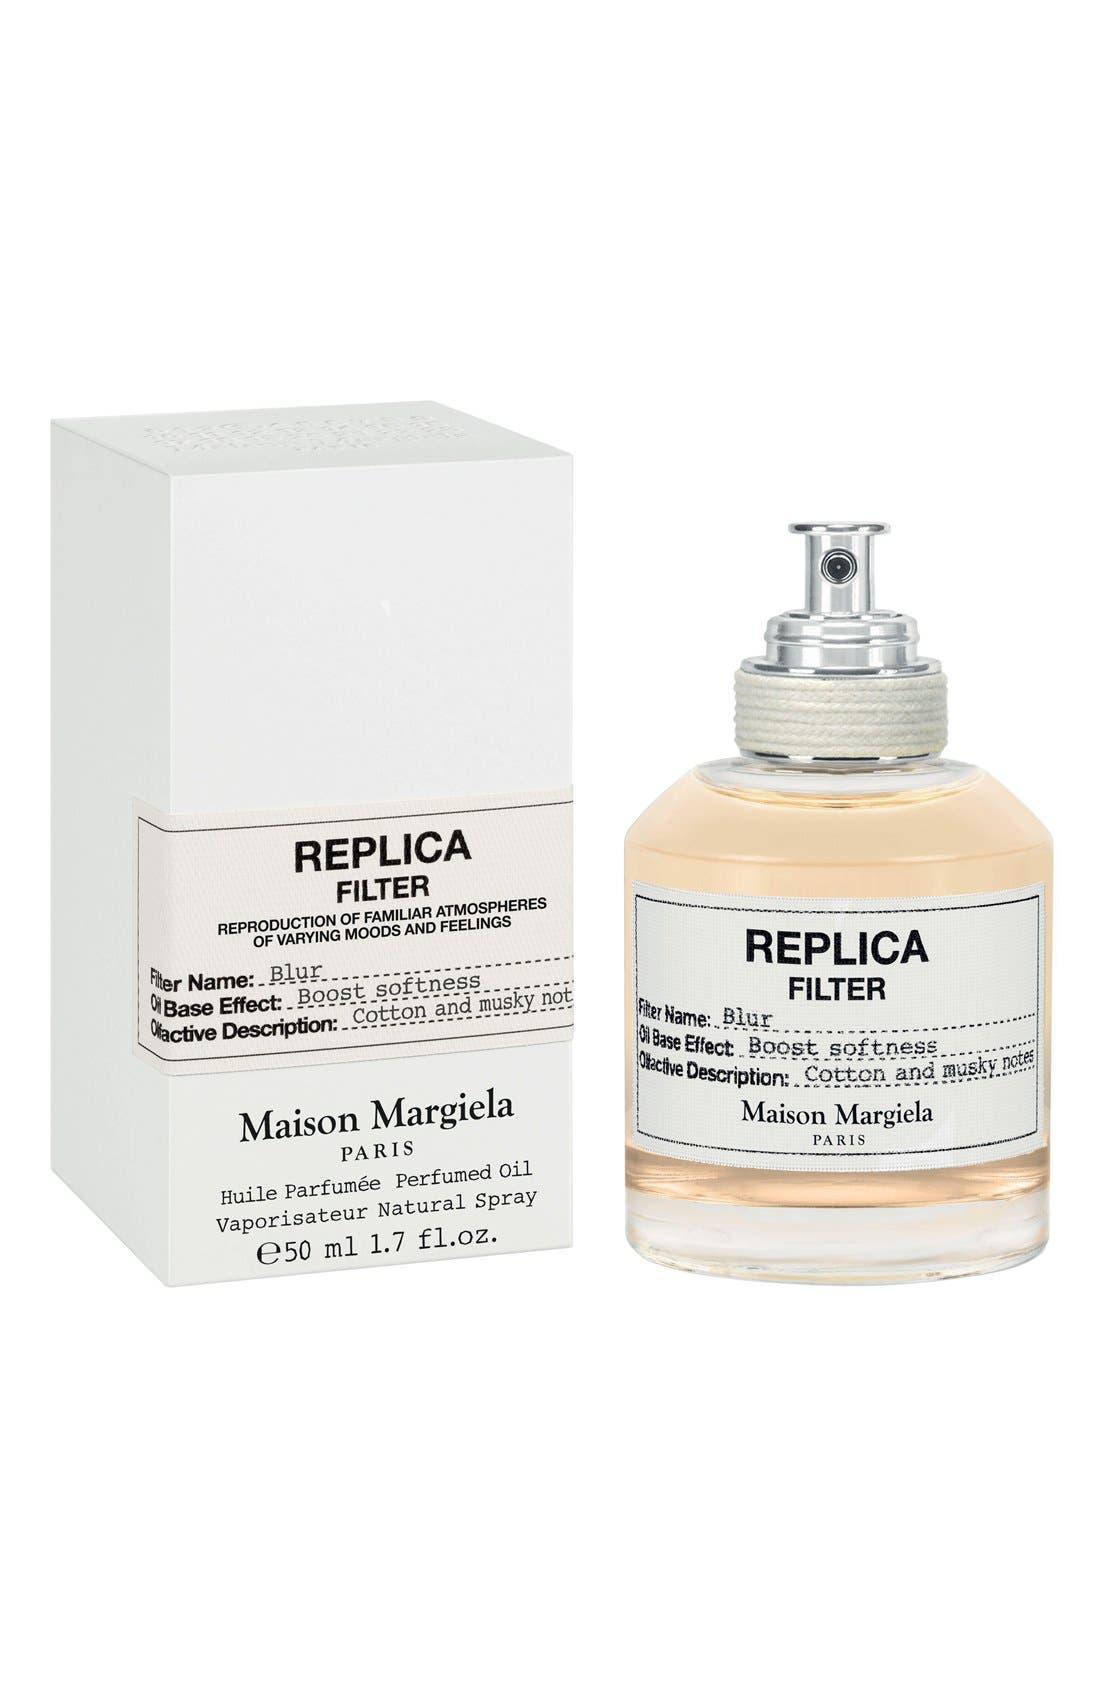 Replica Filter Blur Fragrance Primer,                             Alternate thumbnail 2, color,                             NO COLOR